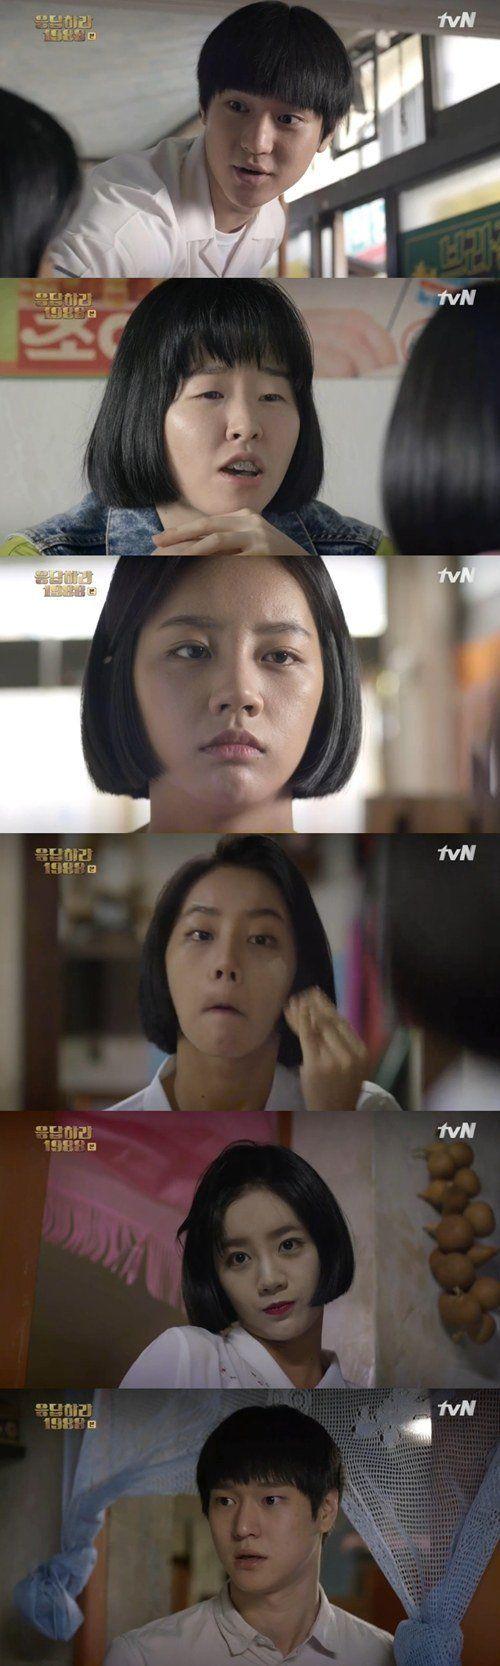 [Spoiler] 'Answer Me 1988' Hyeri has crush on Ko Kyeong-pyo, It's her first love @ HanCinema :: The Korean Movie and Drama Database